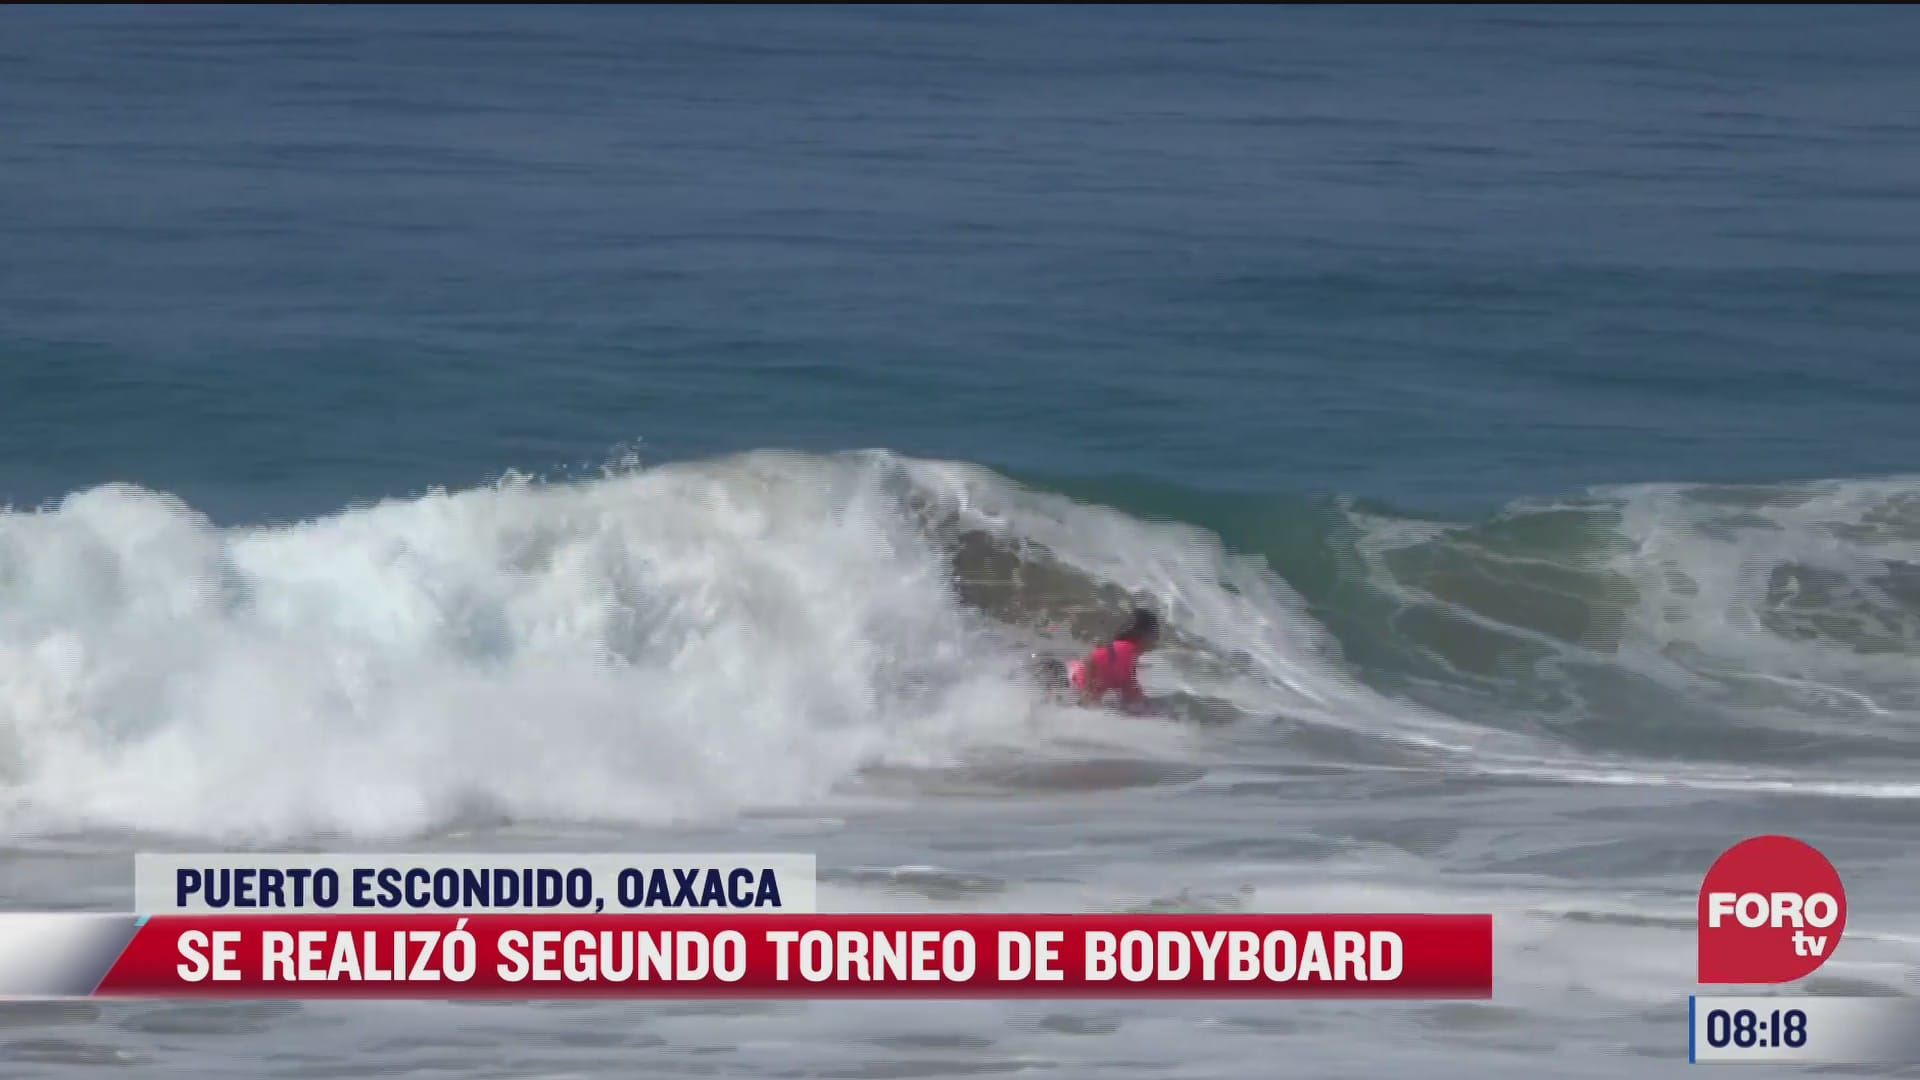 se realiza segundo torneo de bodyboard en puerto escondido oaxaca